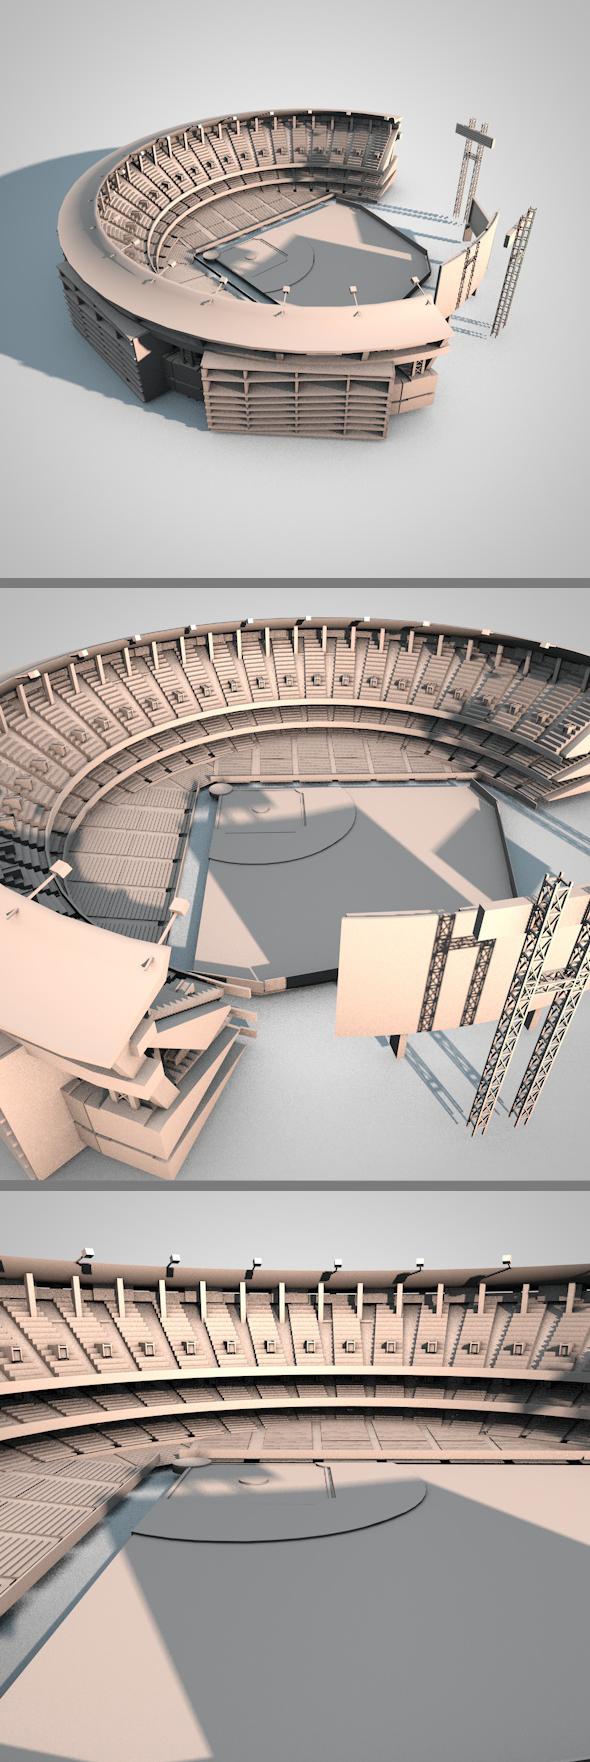 3DOcean Baseball Stadium 16496145